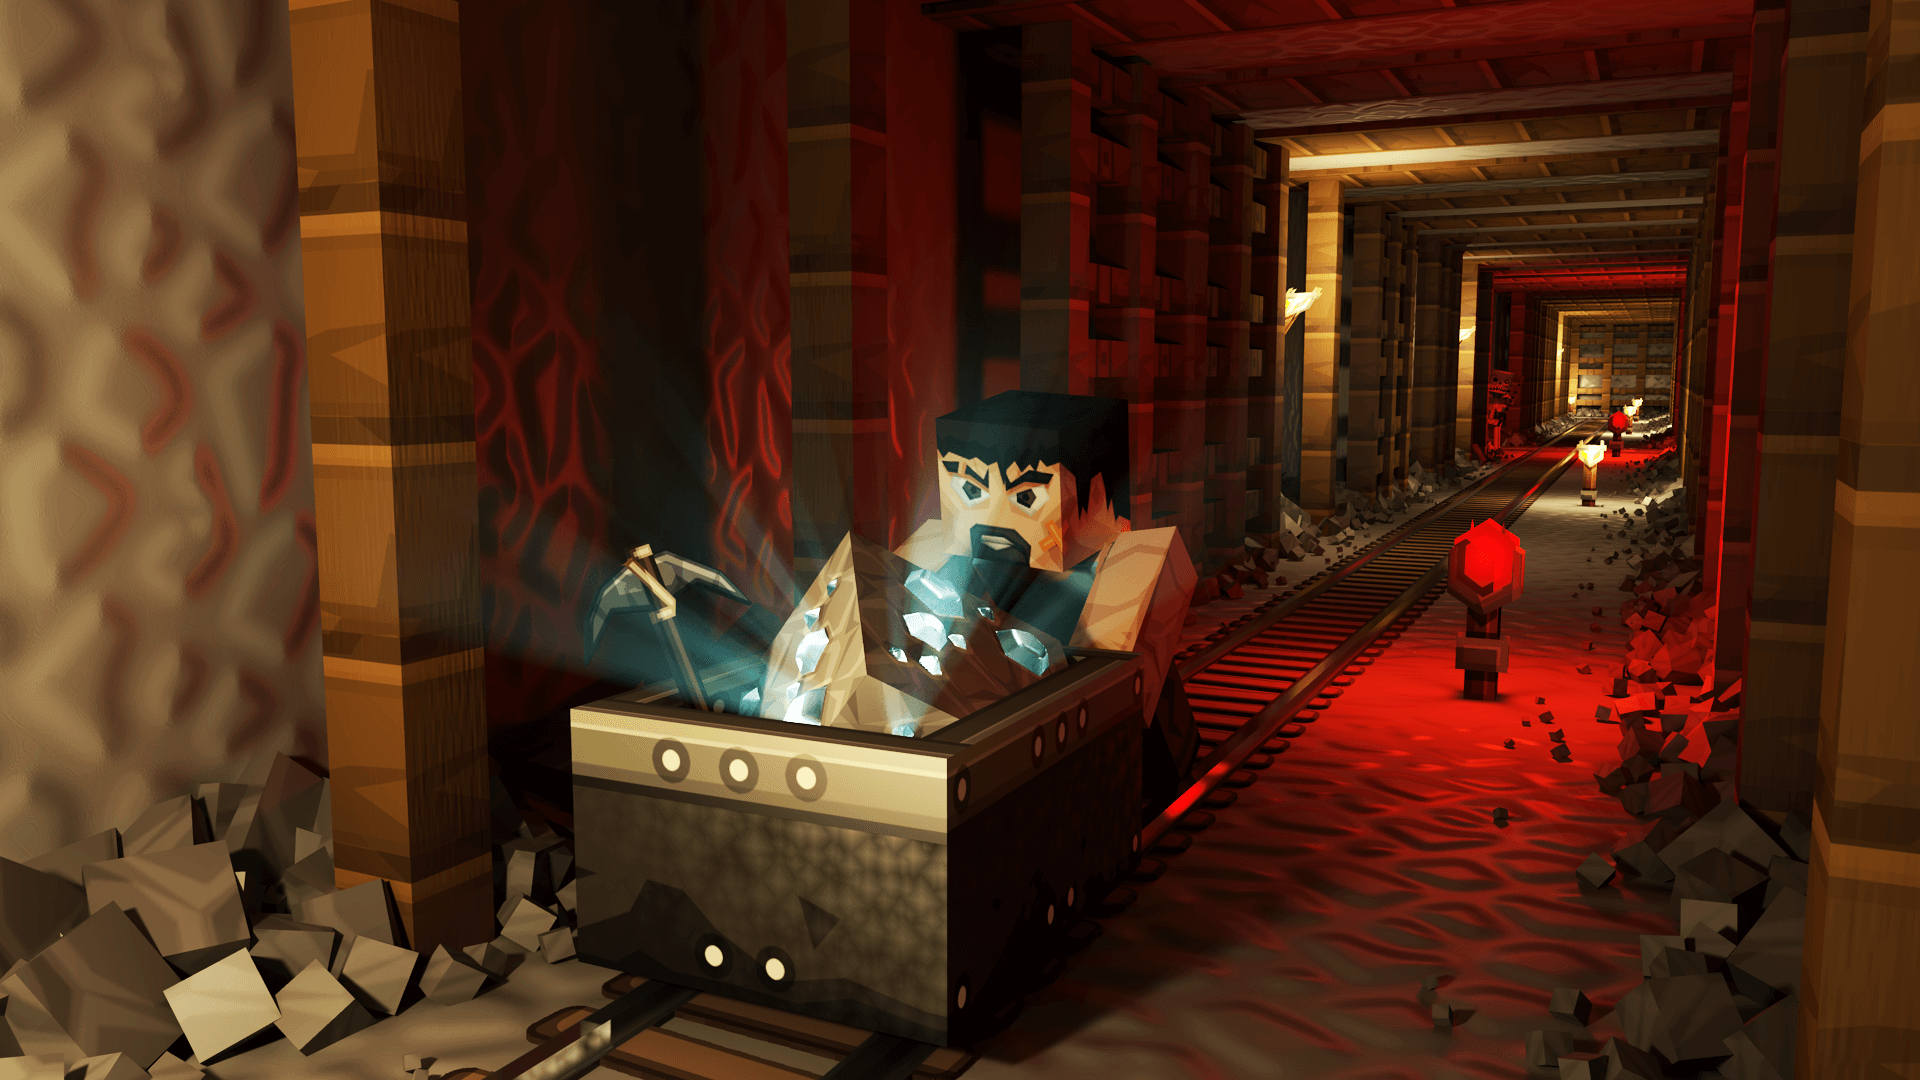 Sphax PureBDcraft - Texture Pack Minecraft 1 13, 1 12 2, 1 8